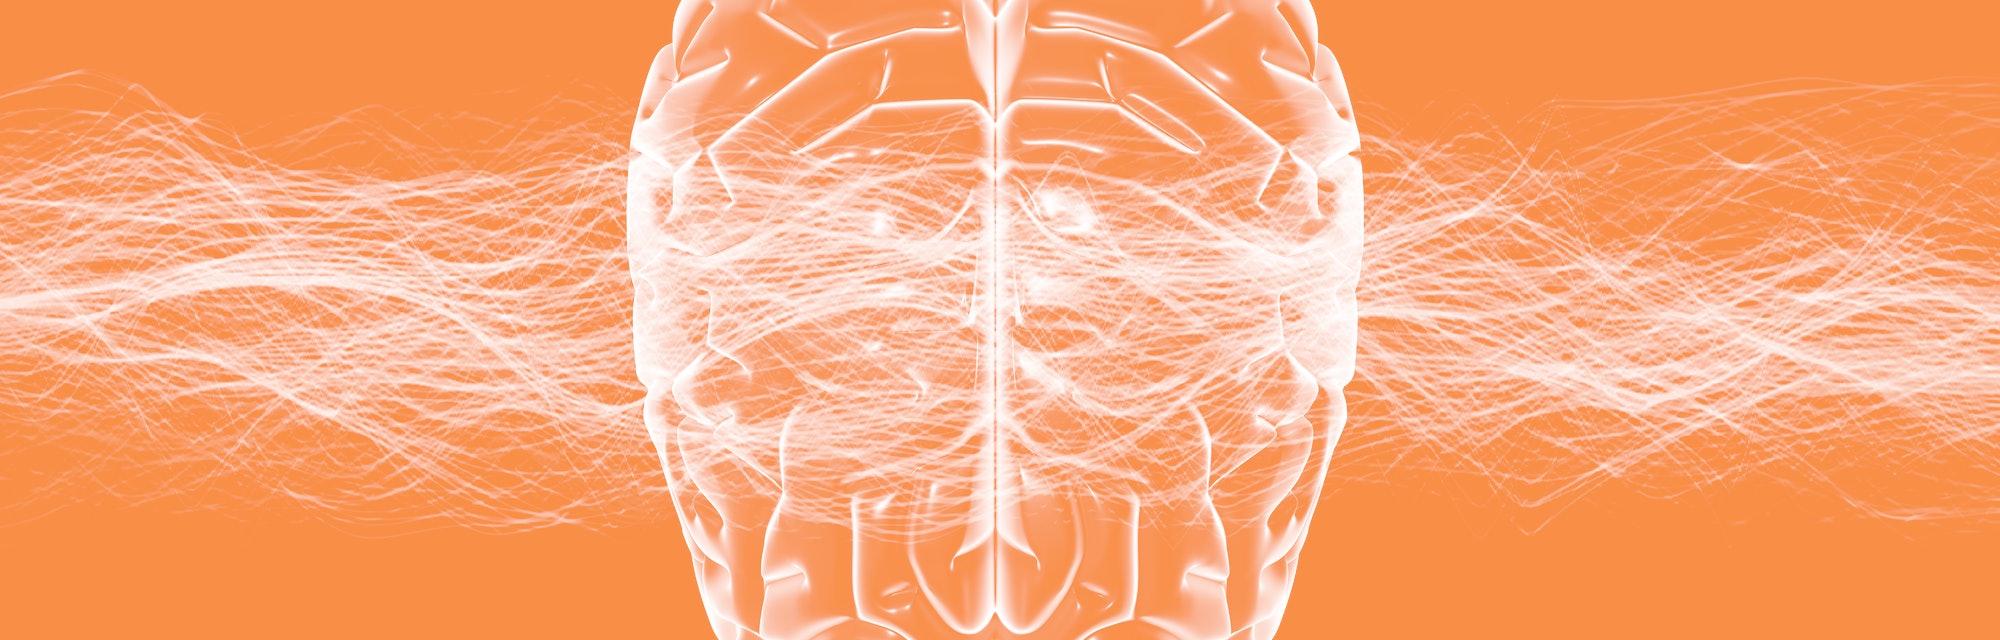 Brain and waves illustration.